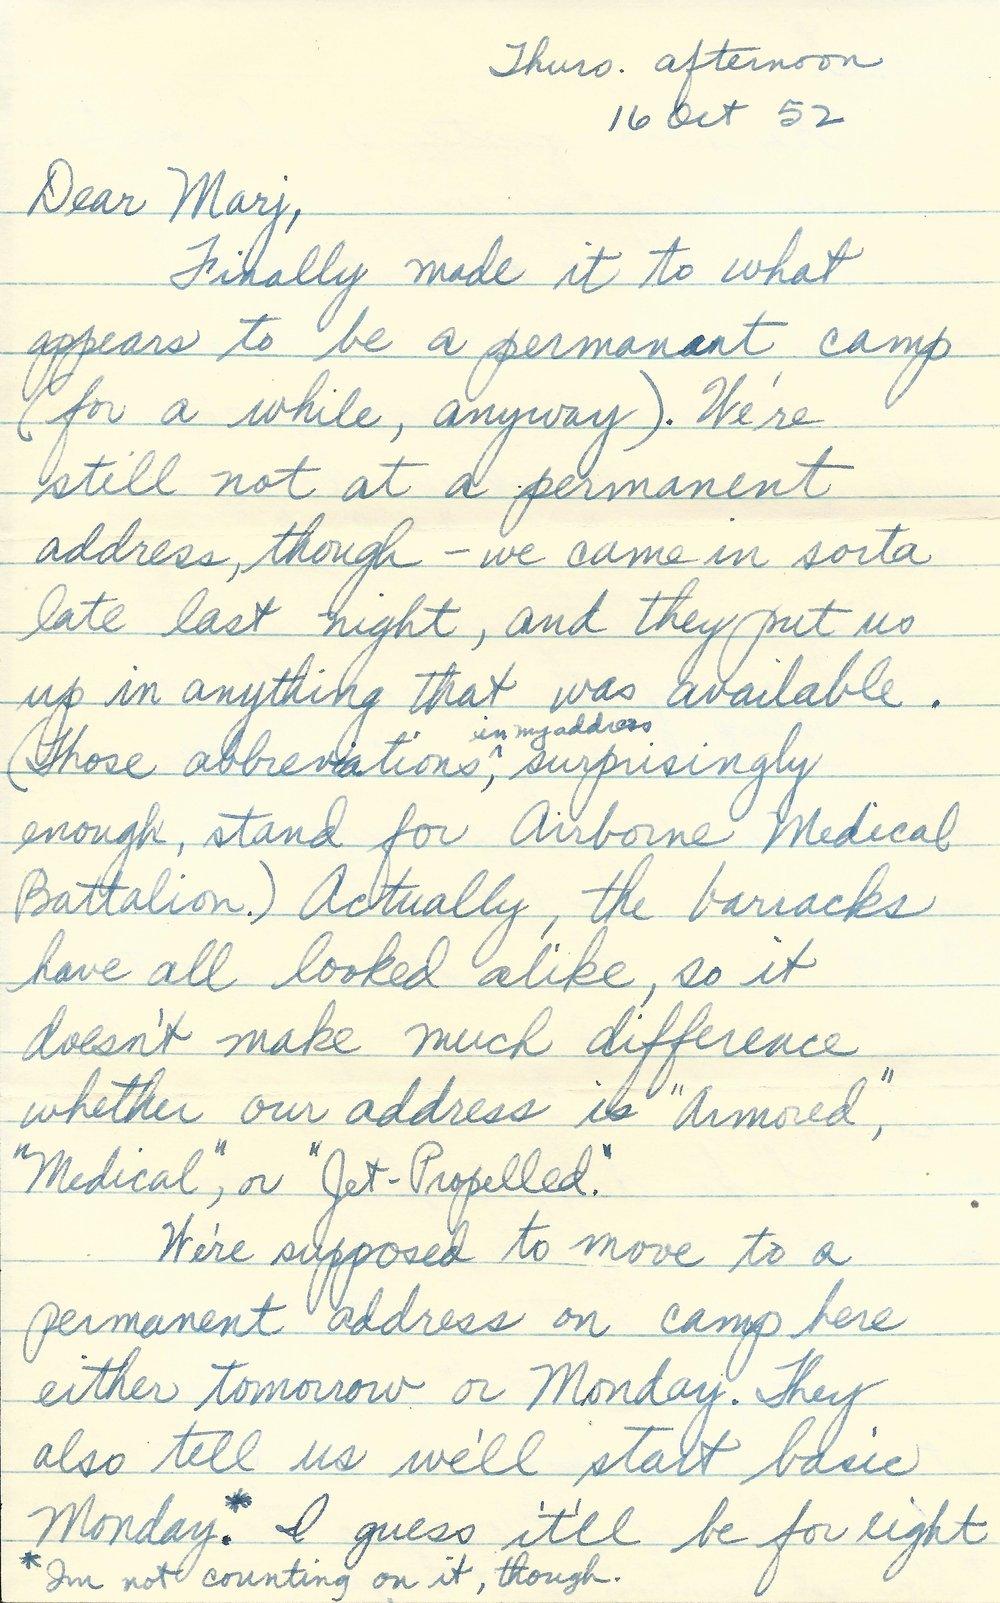 5. Oct. 16, 1952 (Opa)_Page_2.jpg